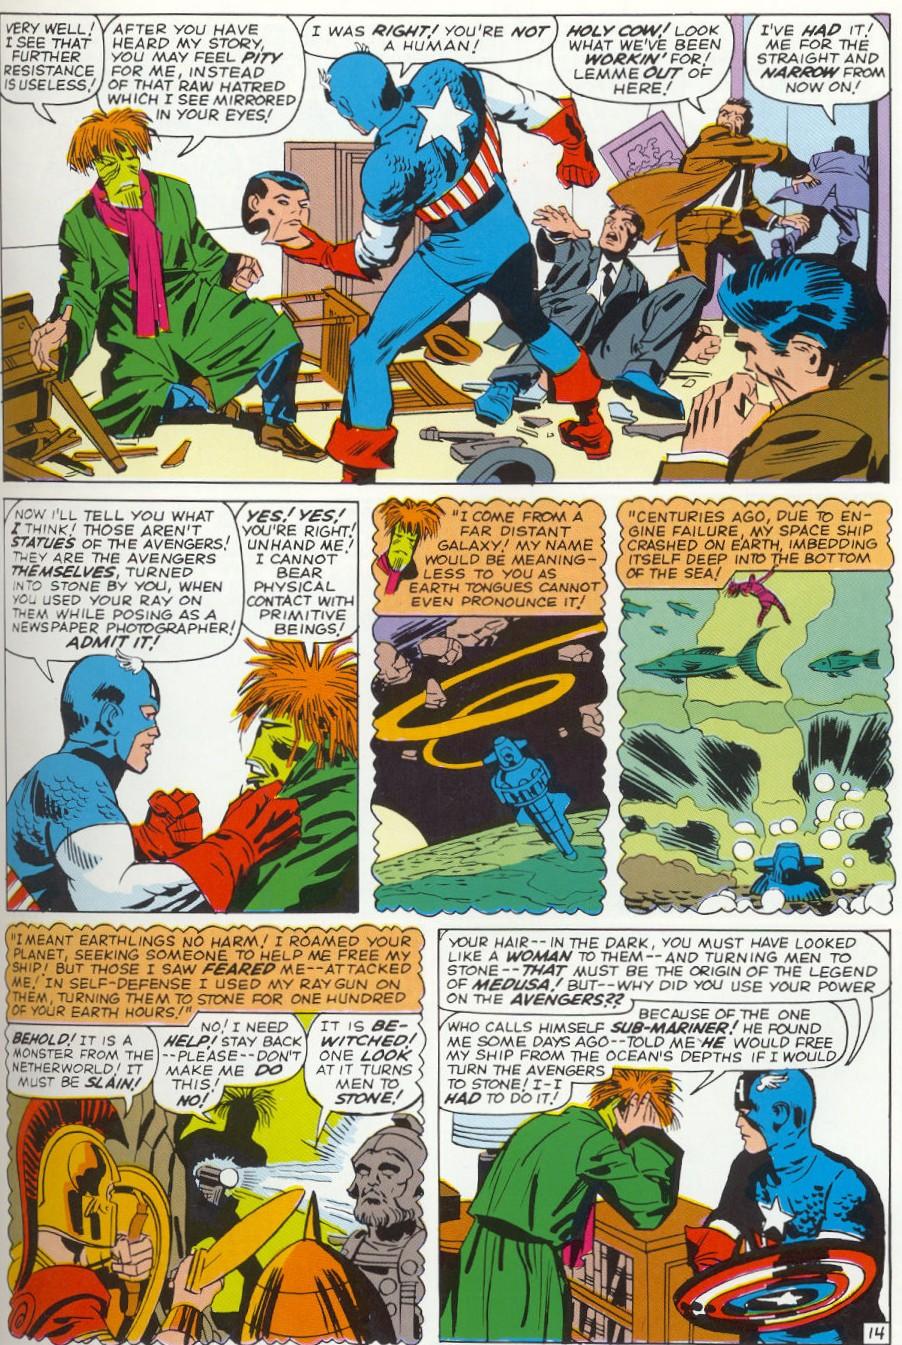 Avengers vol. 1 #4